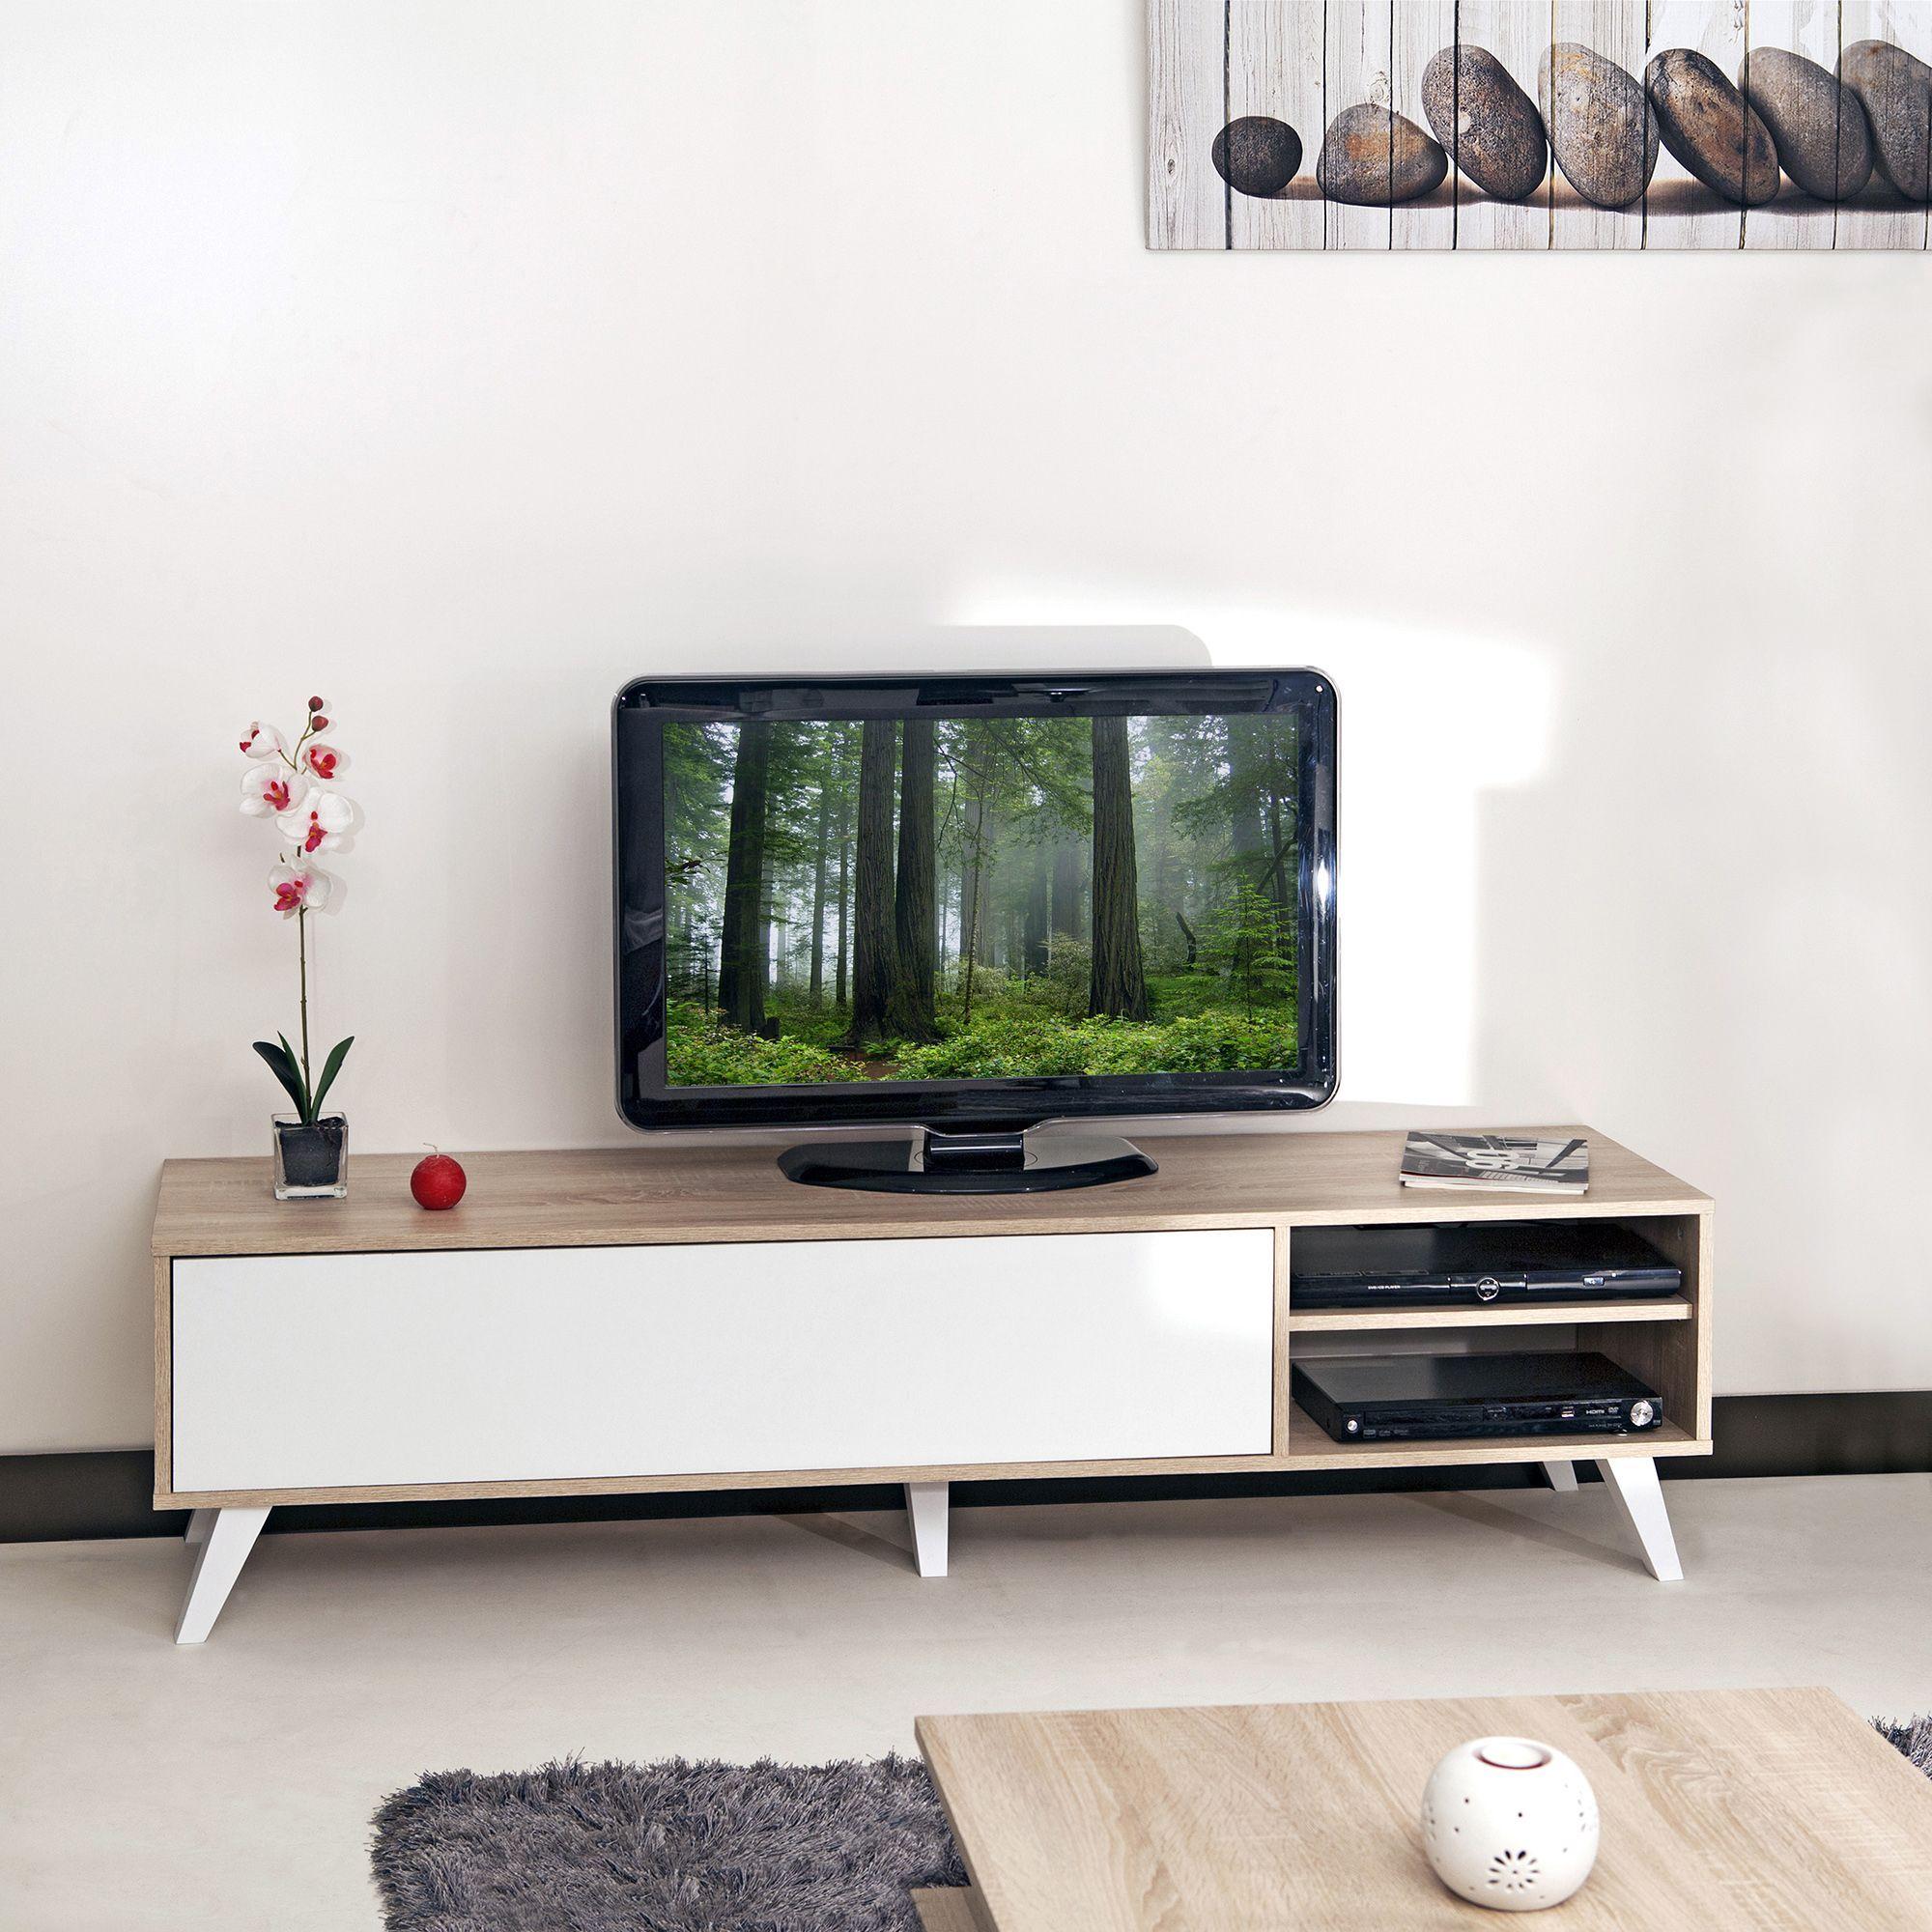 meuble tv style scandinave coloris